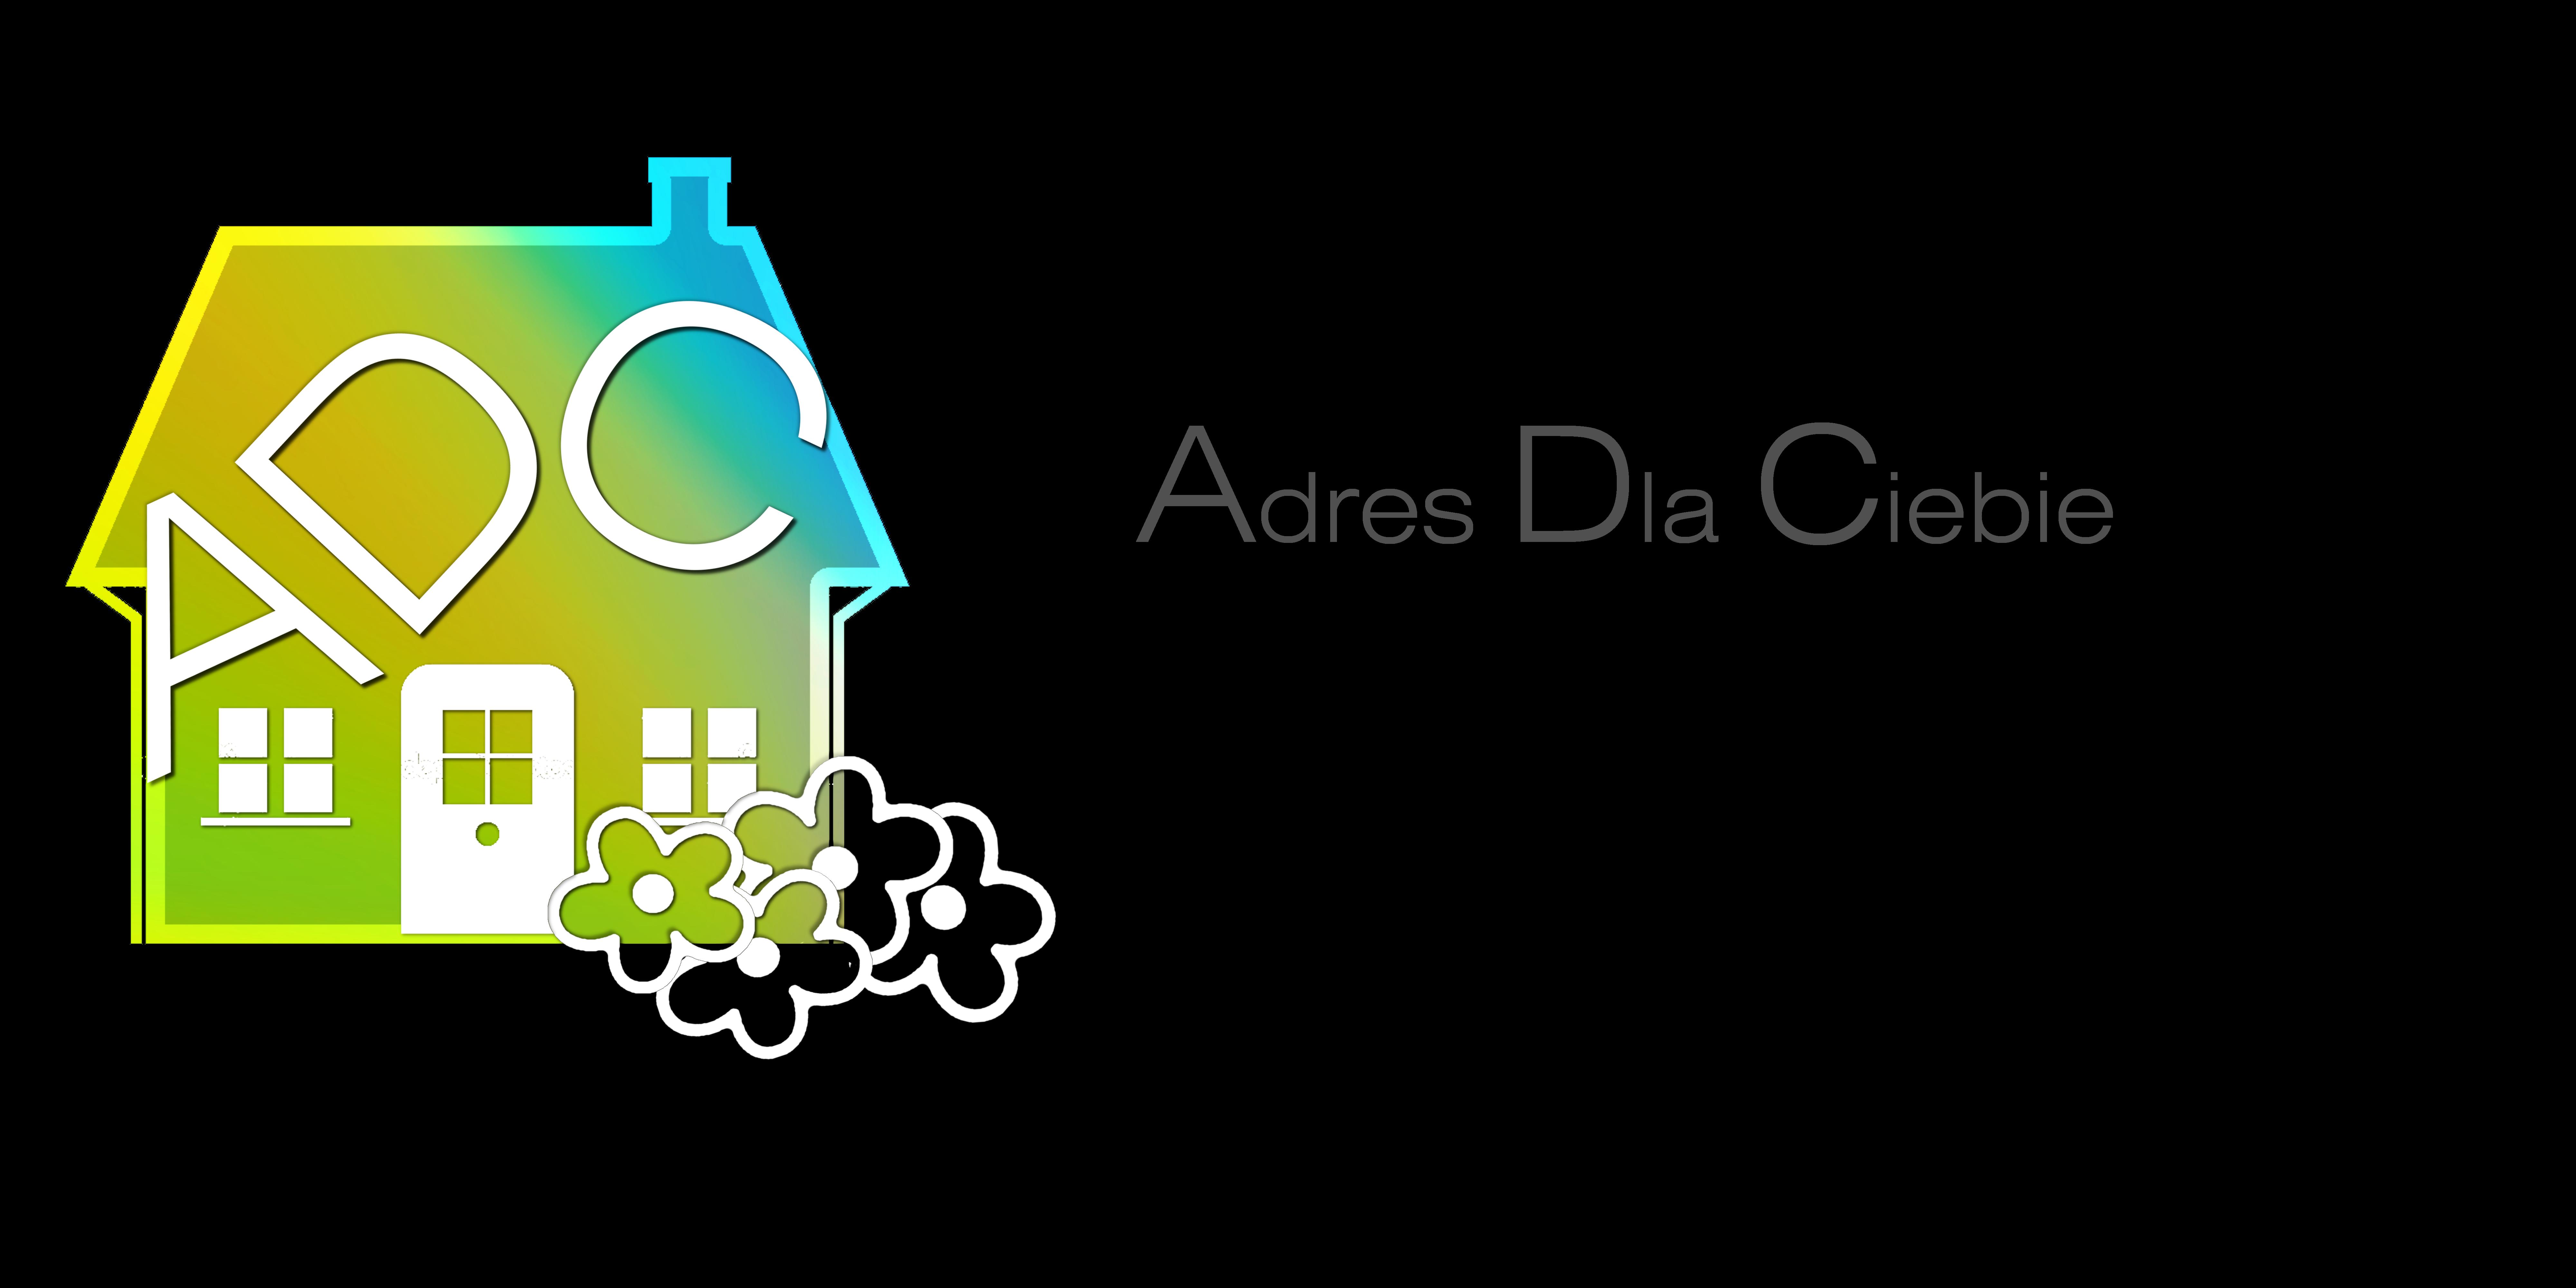 ADC Adres Dla Ciebie